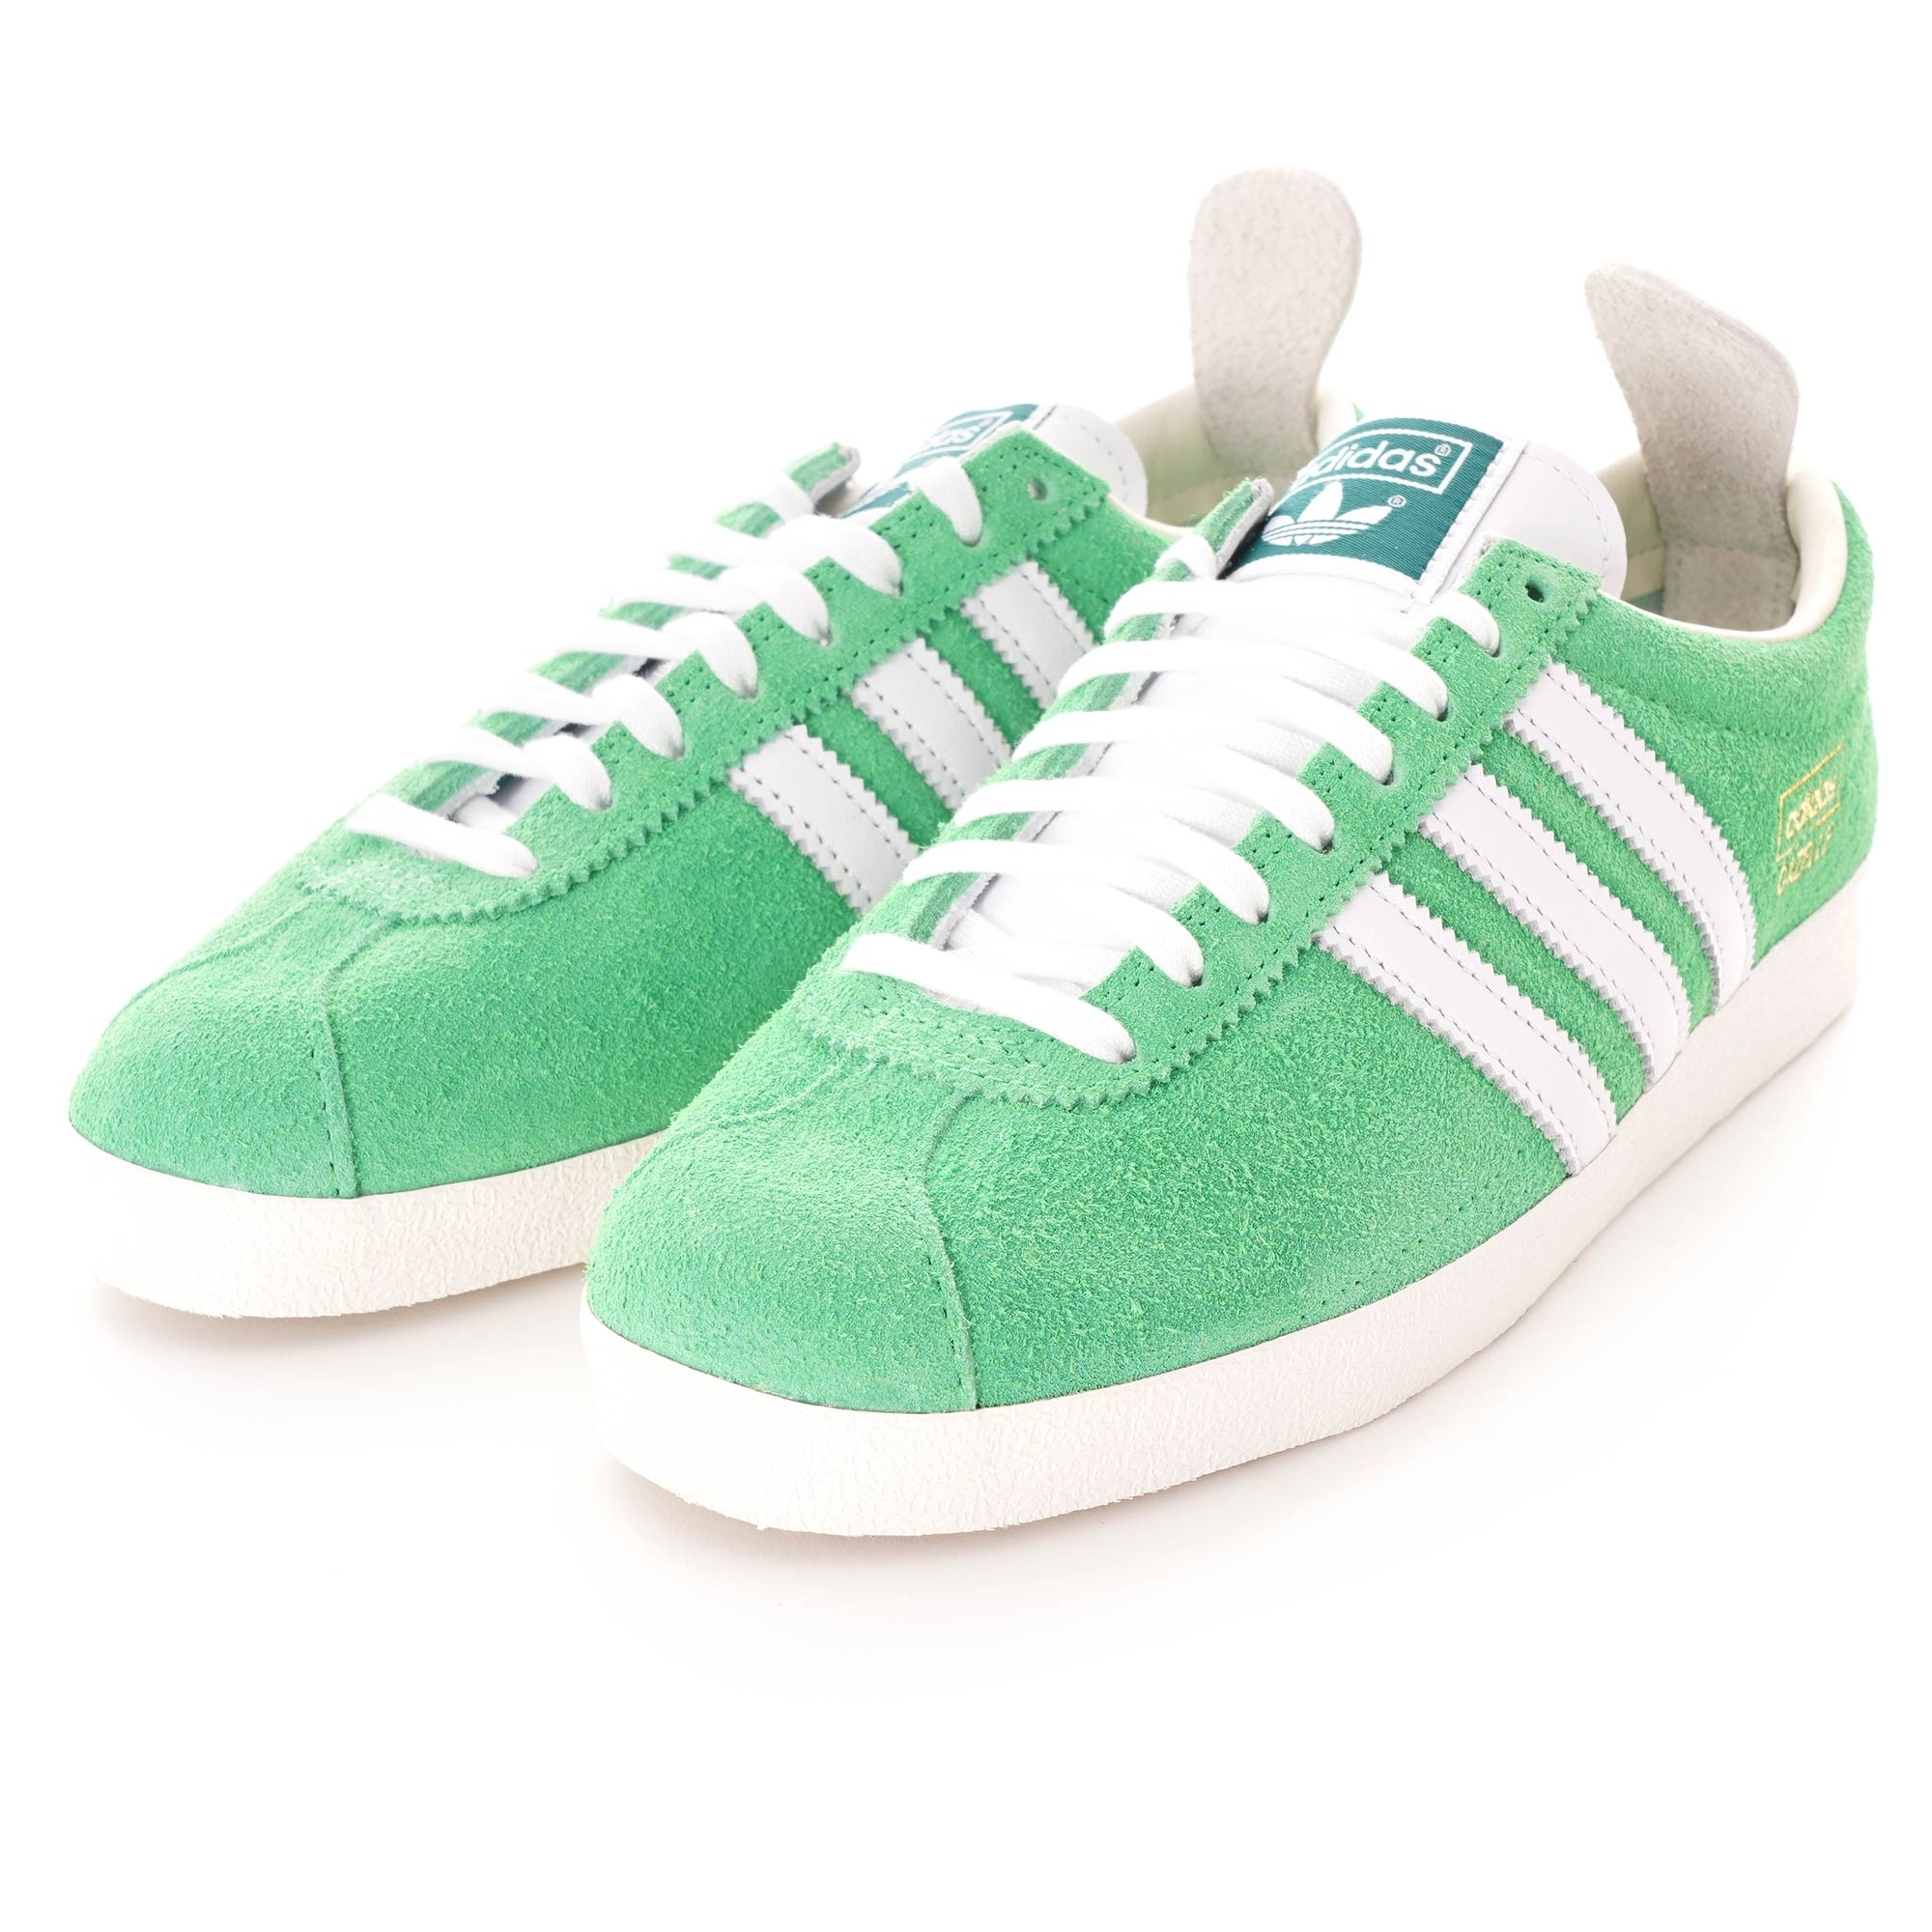 Gazelle Vintage - Green